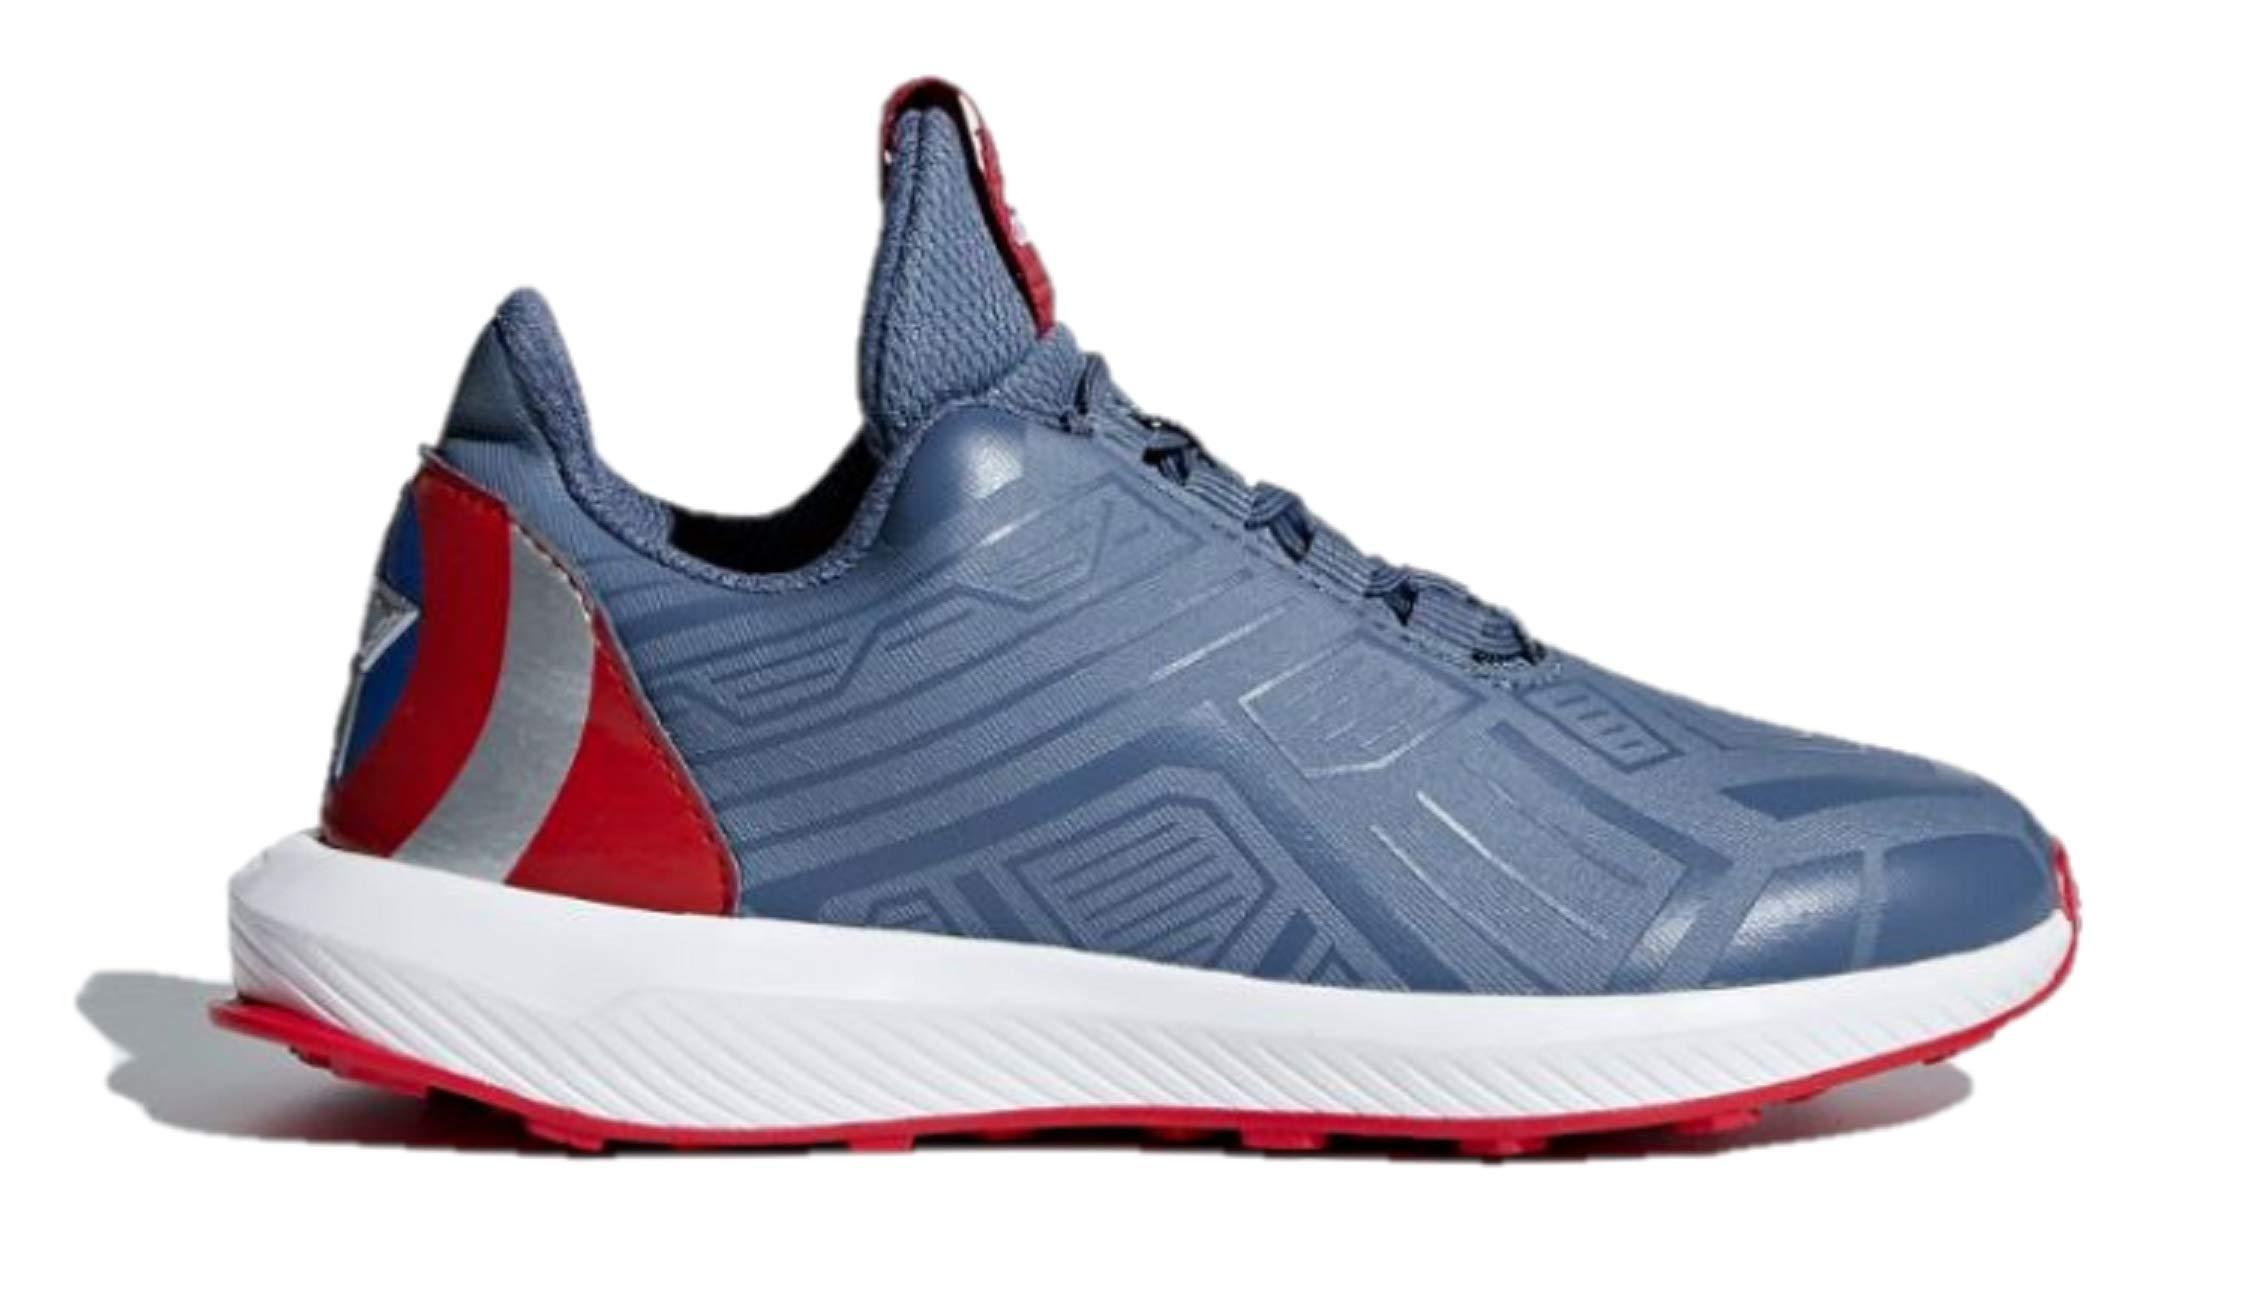 adidas RapidaRun Unisex Kids Running Marvel Captain America LTD Sneakers (2 M US, Raw Steel/Tech Ink/Scarlet)